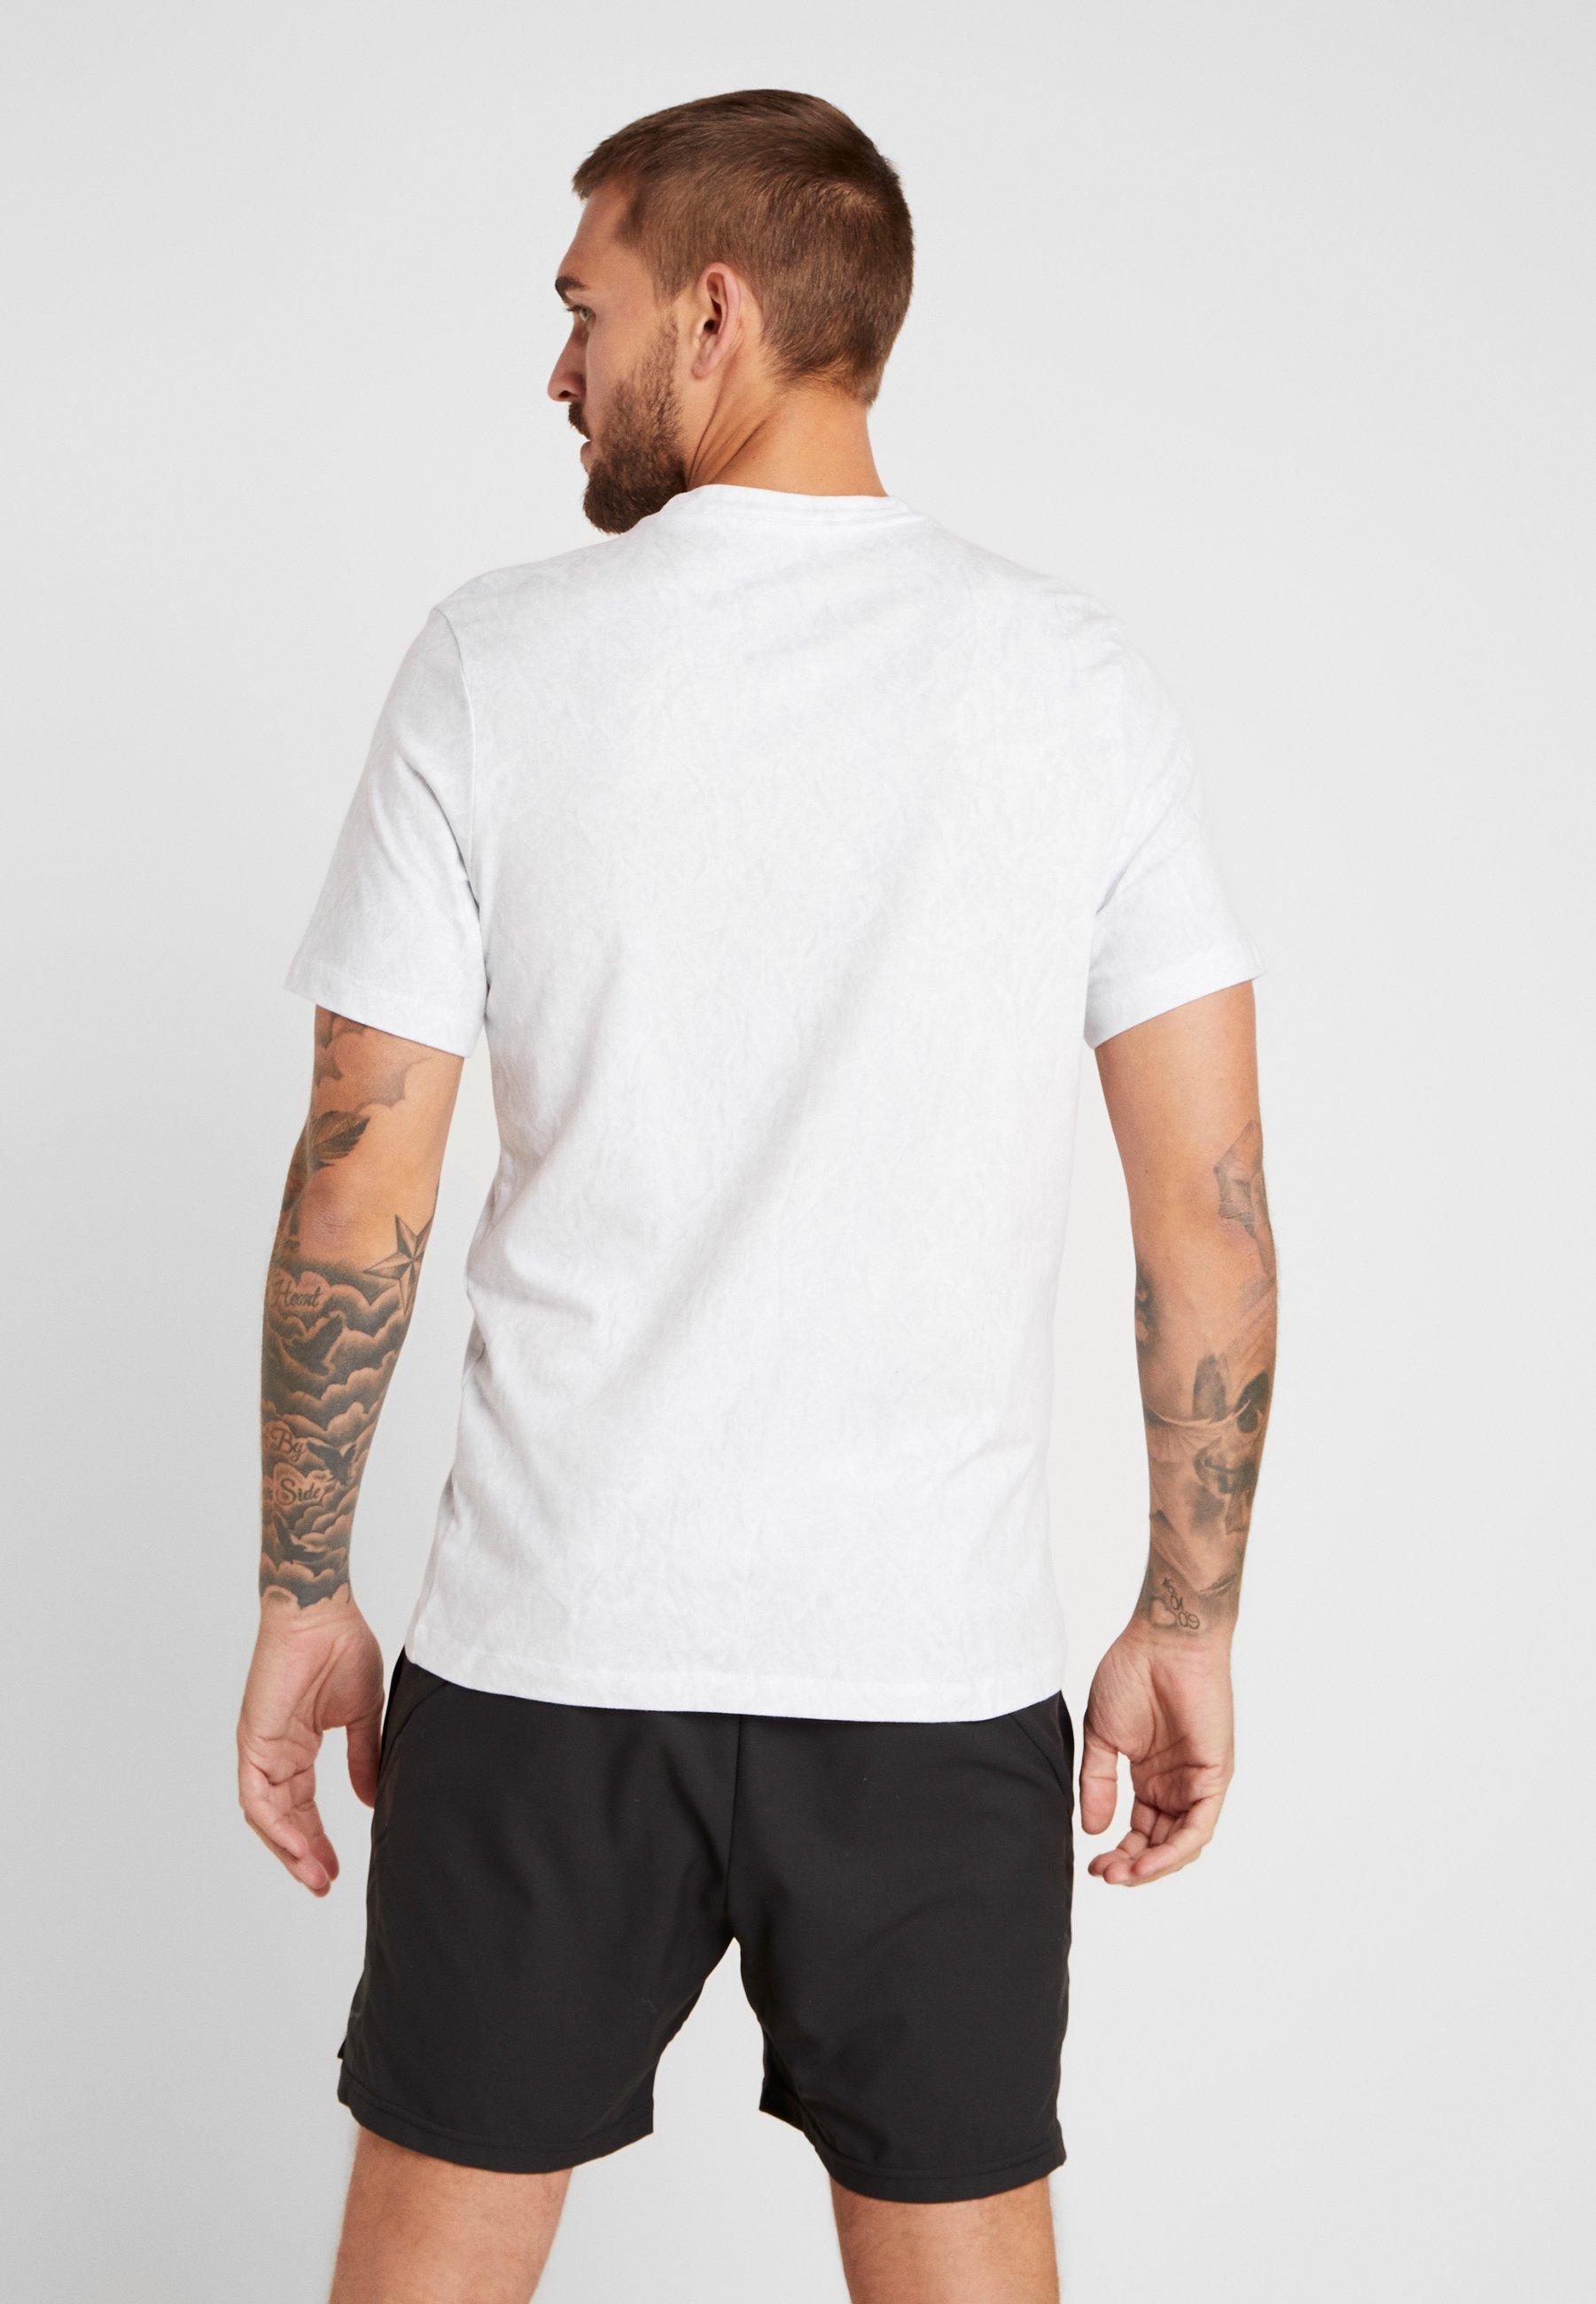 Nike White Tee shirt WimbledonT Performance Imprimé QWderoExBC